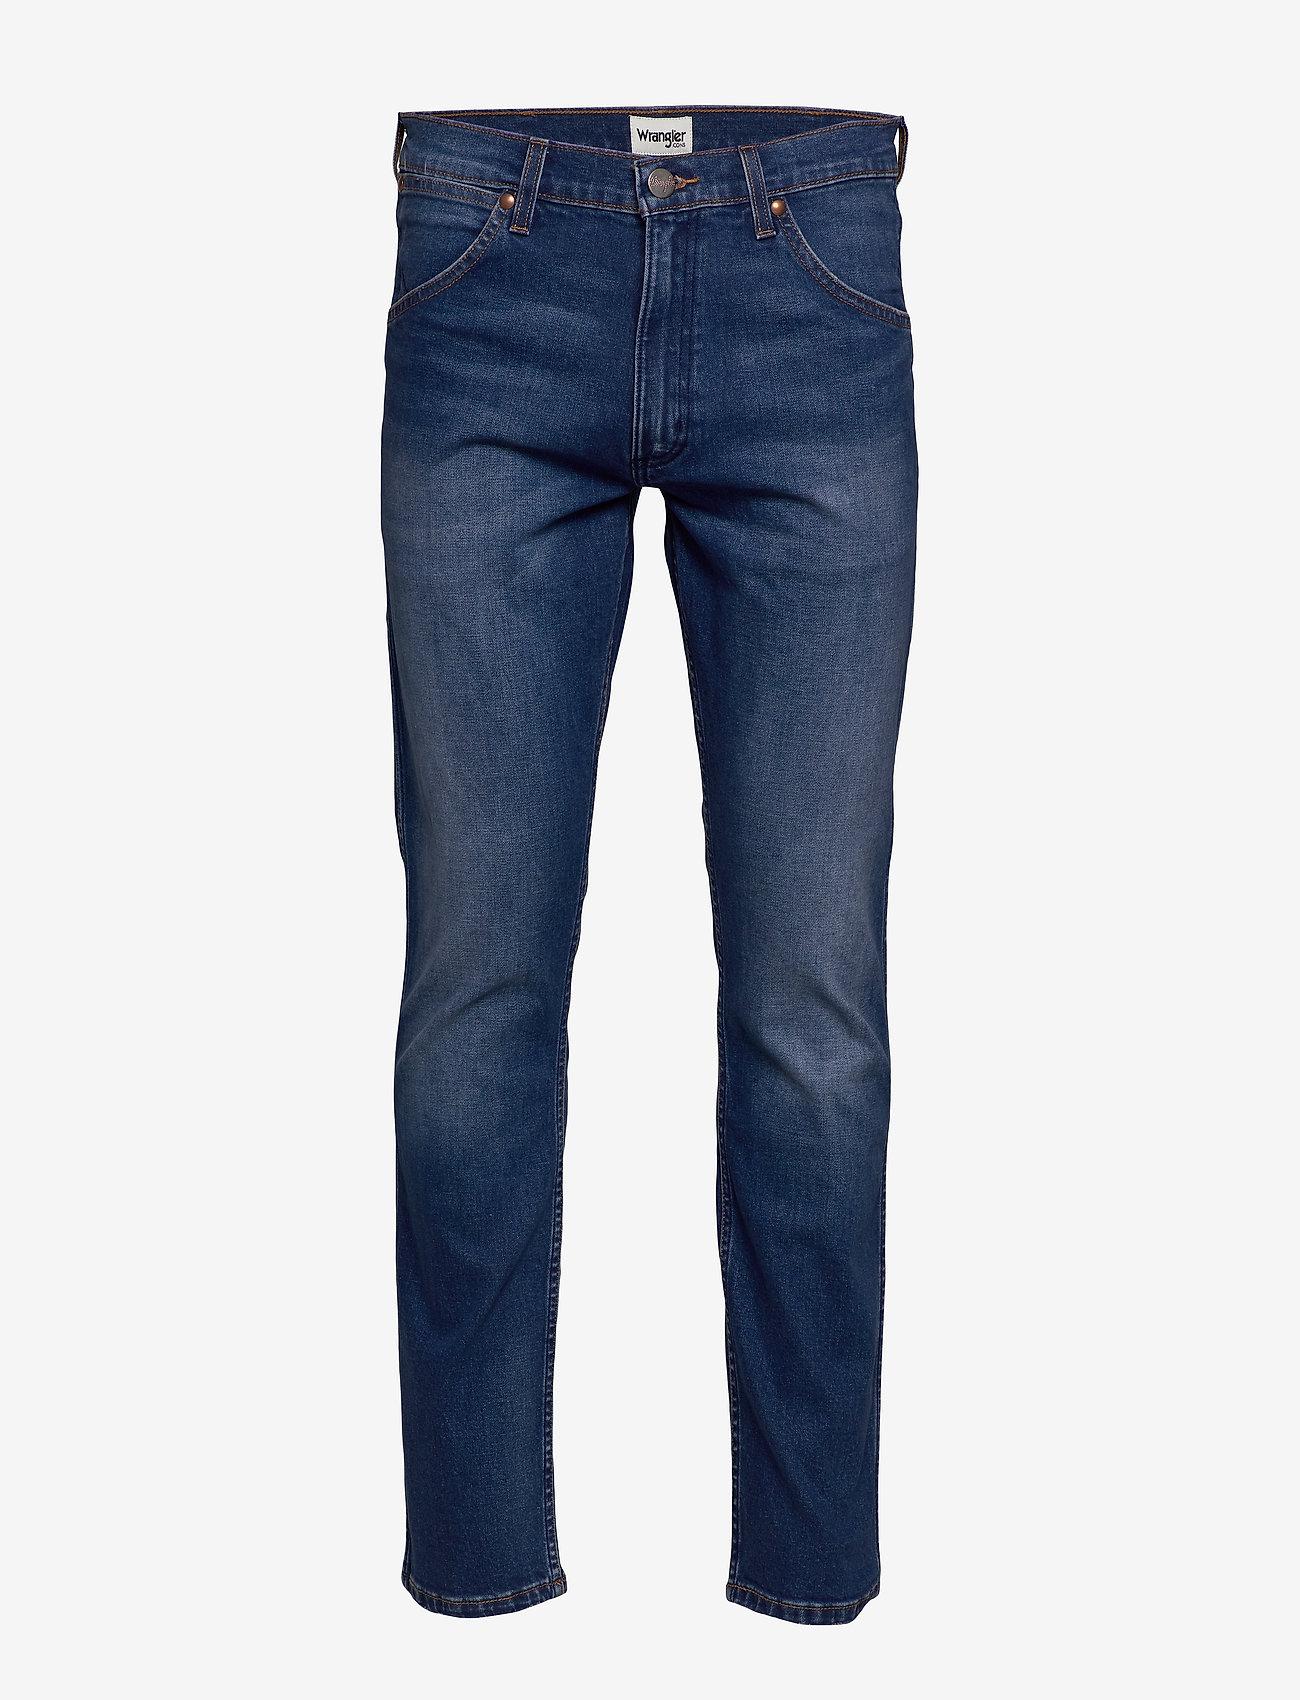 Wrangler 11MWZ - Jeans 1 YEAR RmFjm9rL